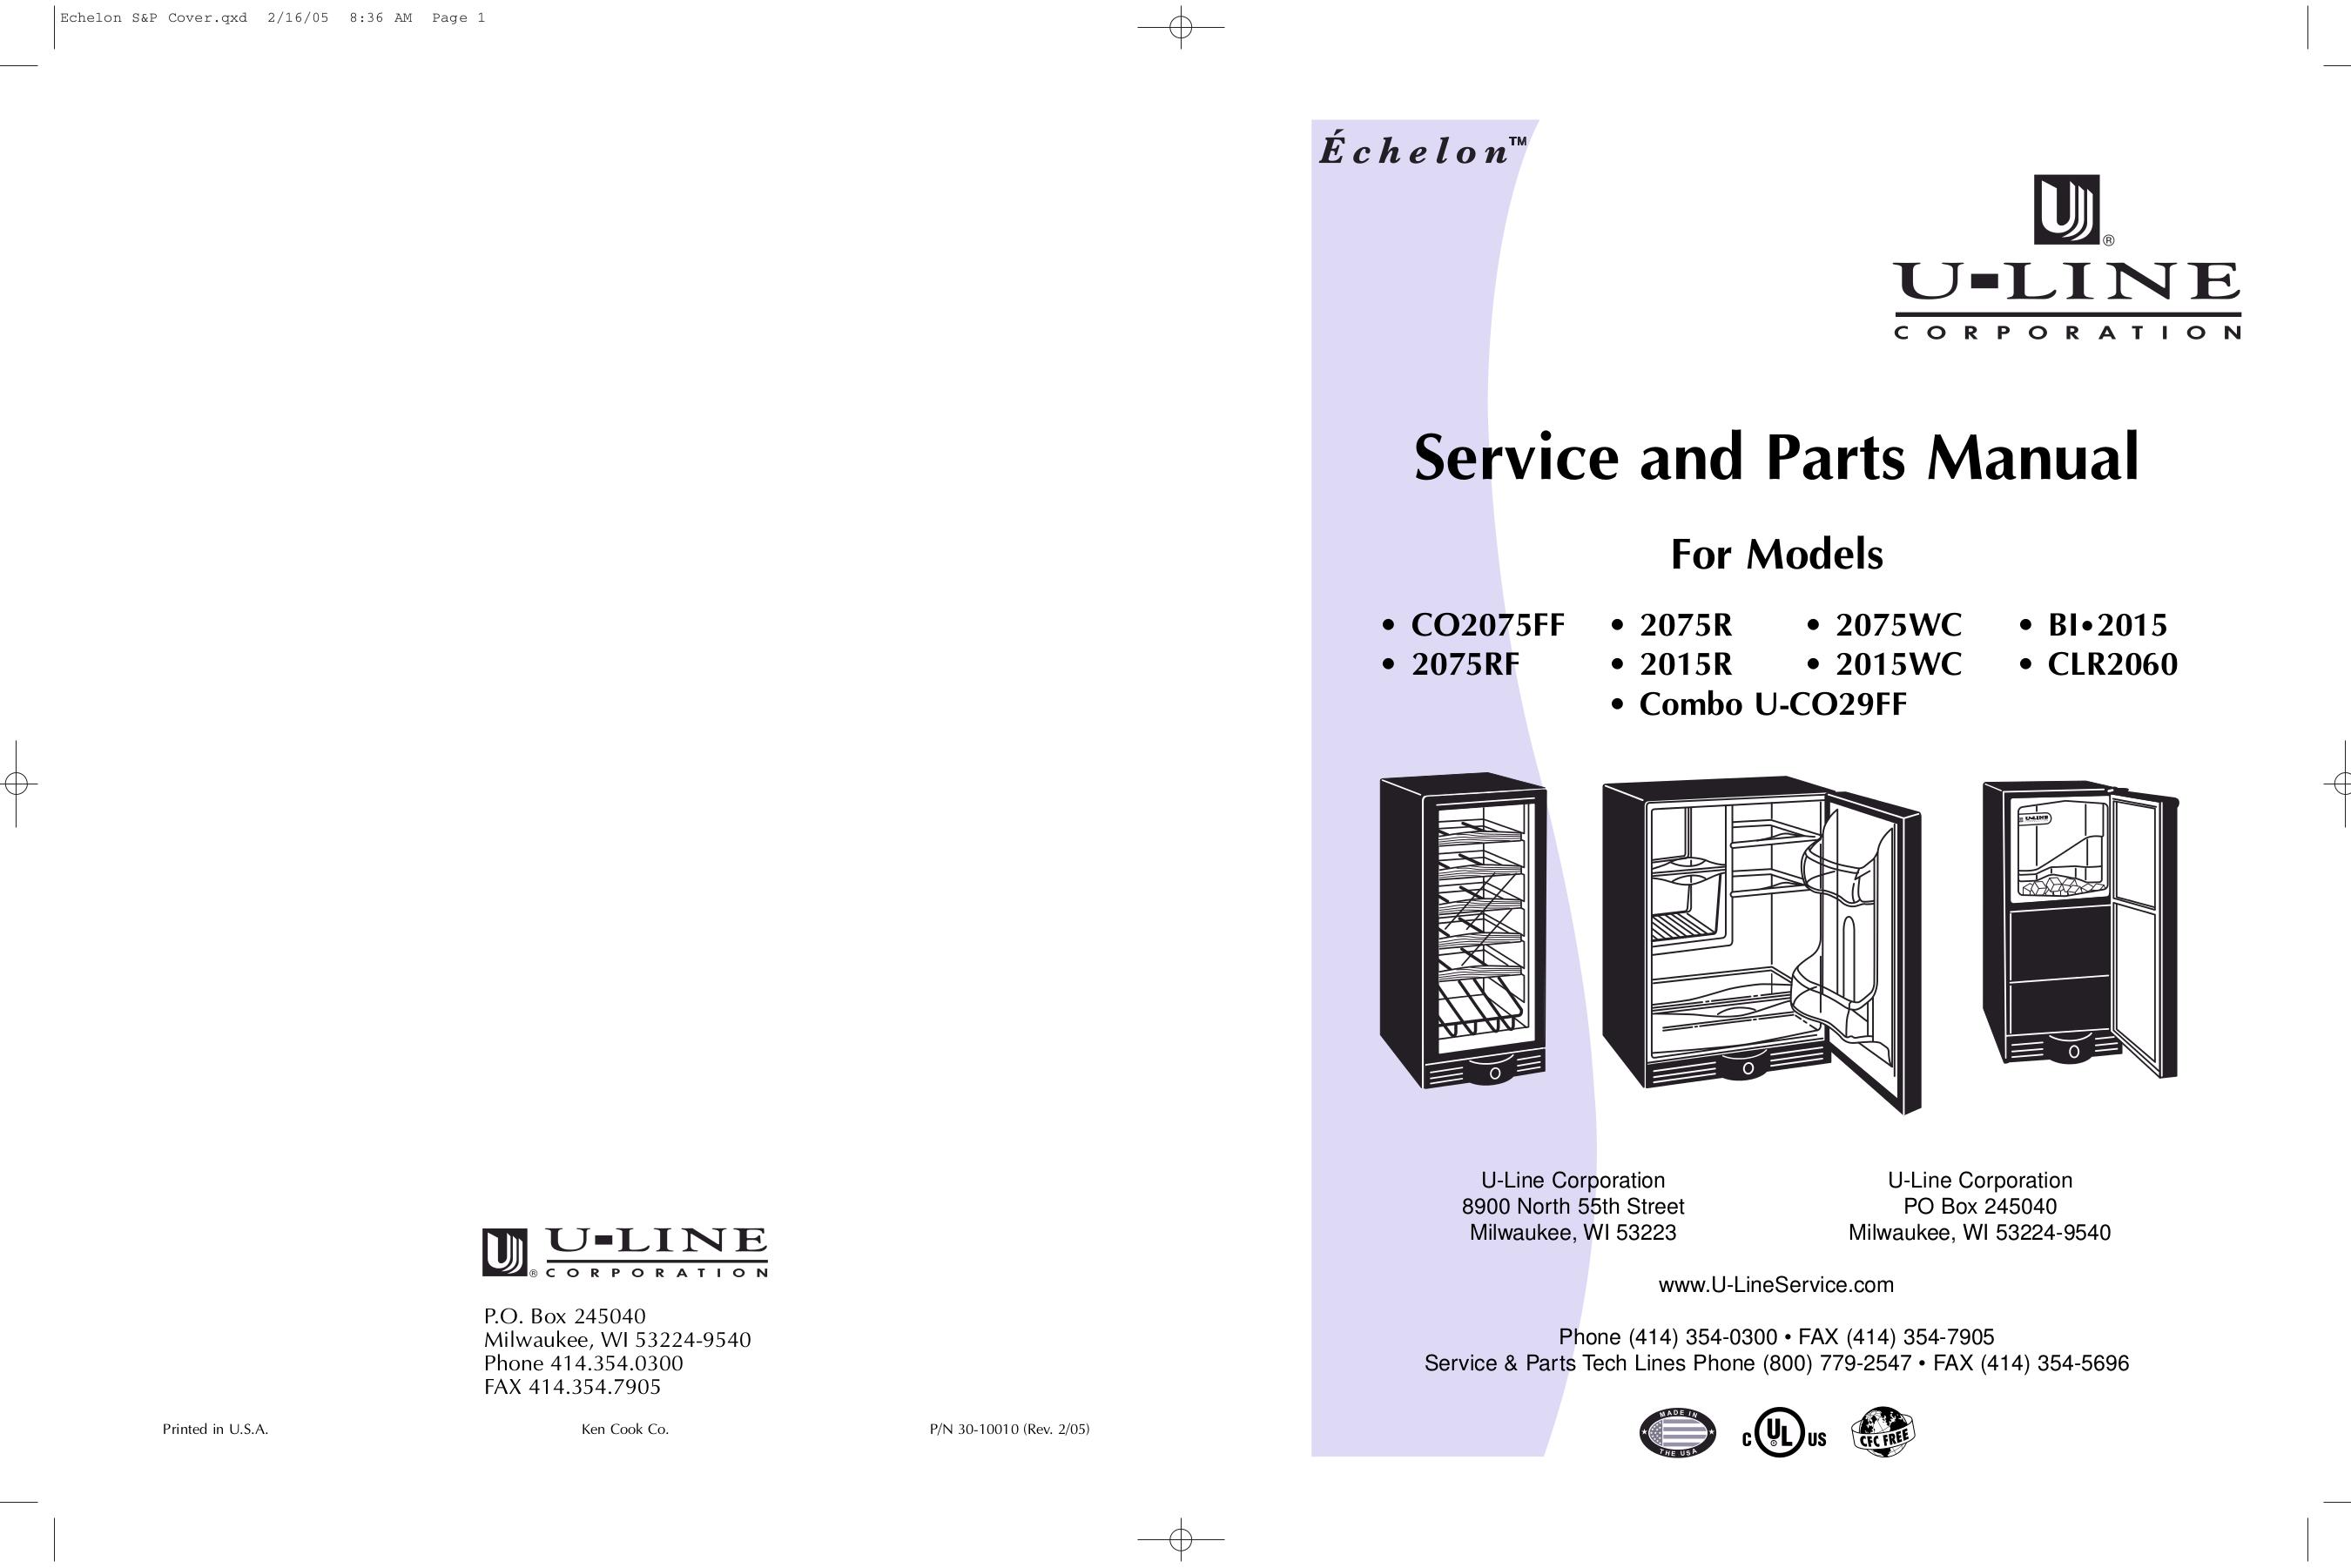 download free pdf for u line echelon co2075ff refrigerator manual rh umlib com u-line refrigerator parts list u-line refrigerator parts